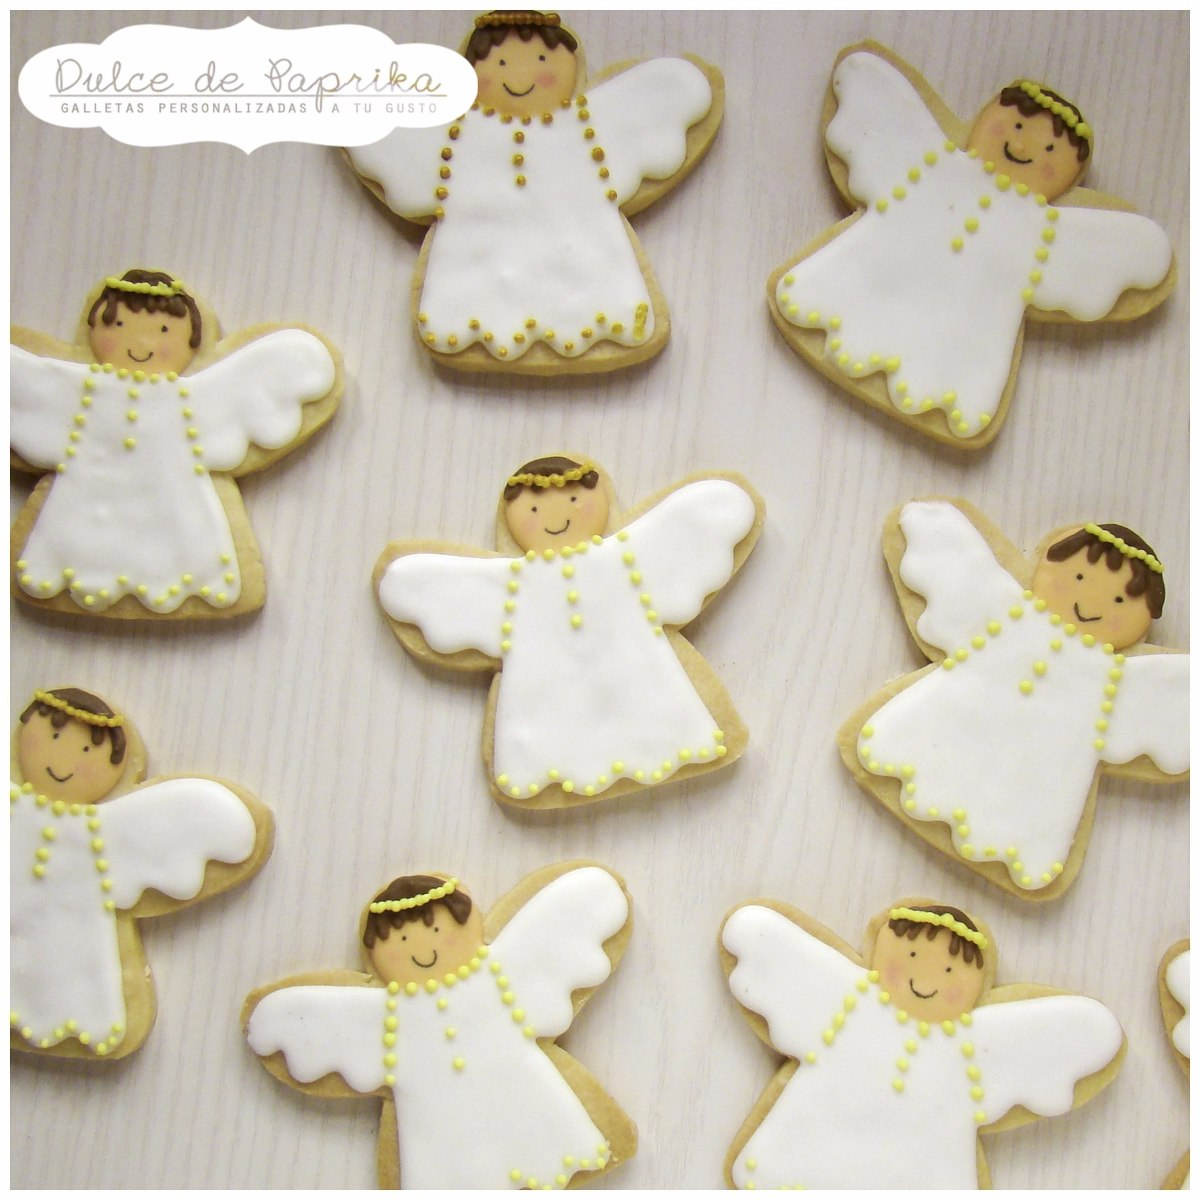 Cookies Galletas Decoradas Comunion Bautismo Souvenir